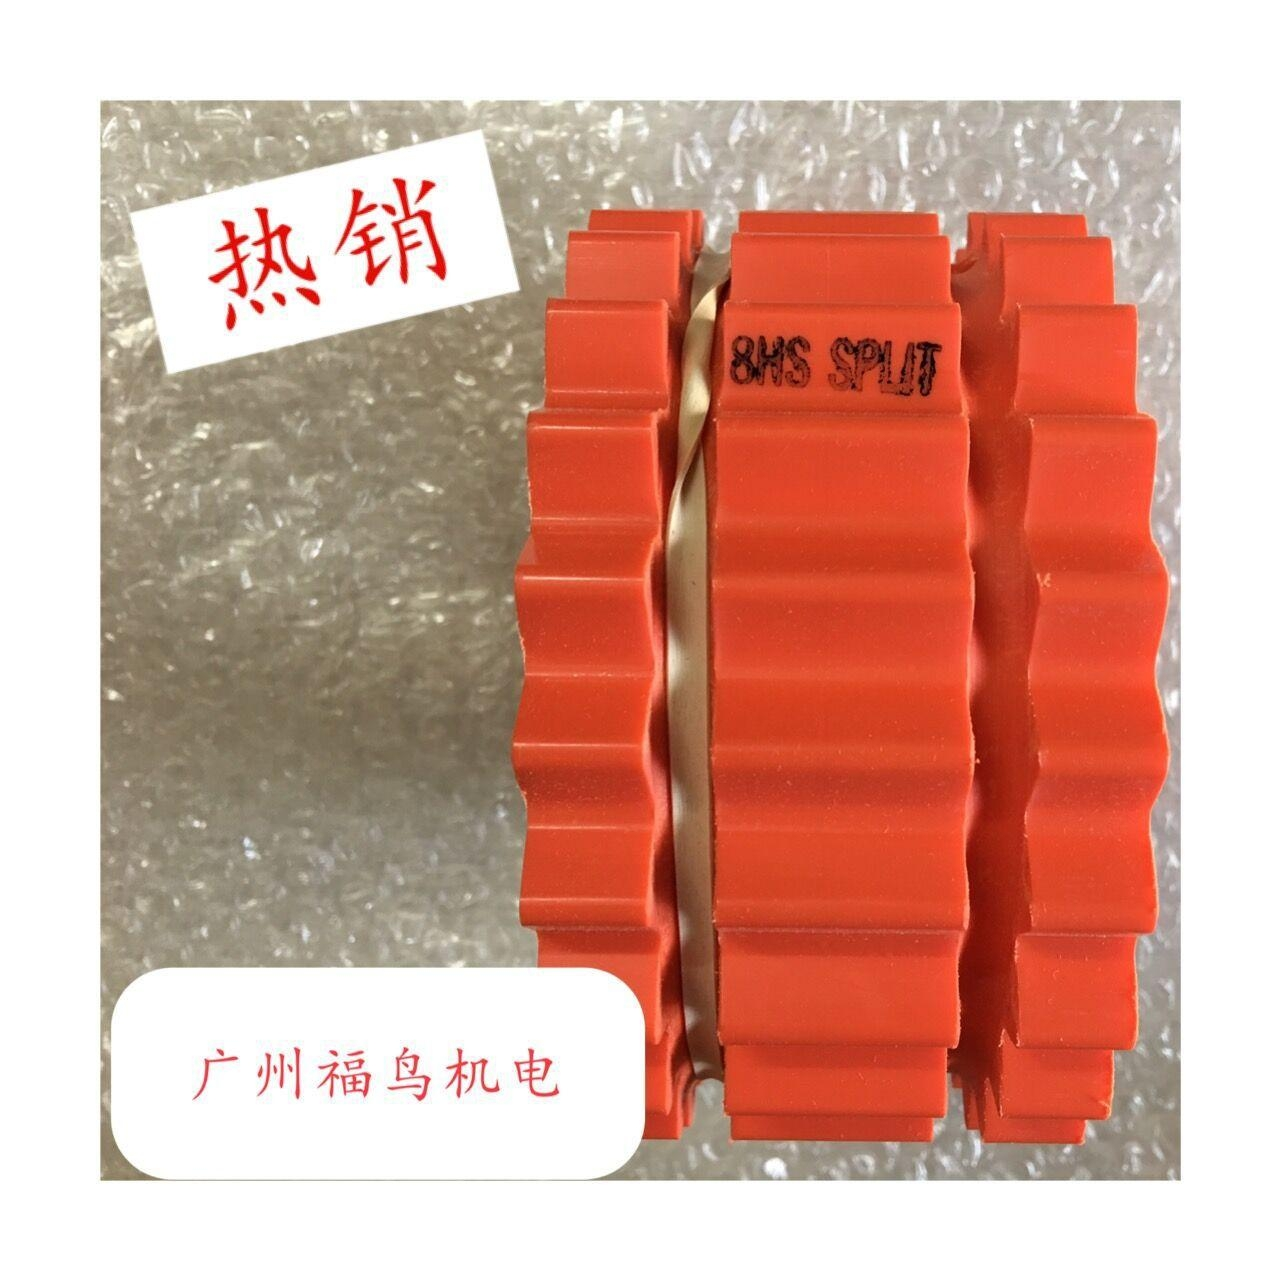 TB WOODS联轴器用橡胶块, 弹性体, 型号:  8HS